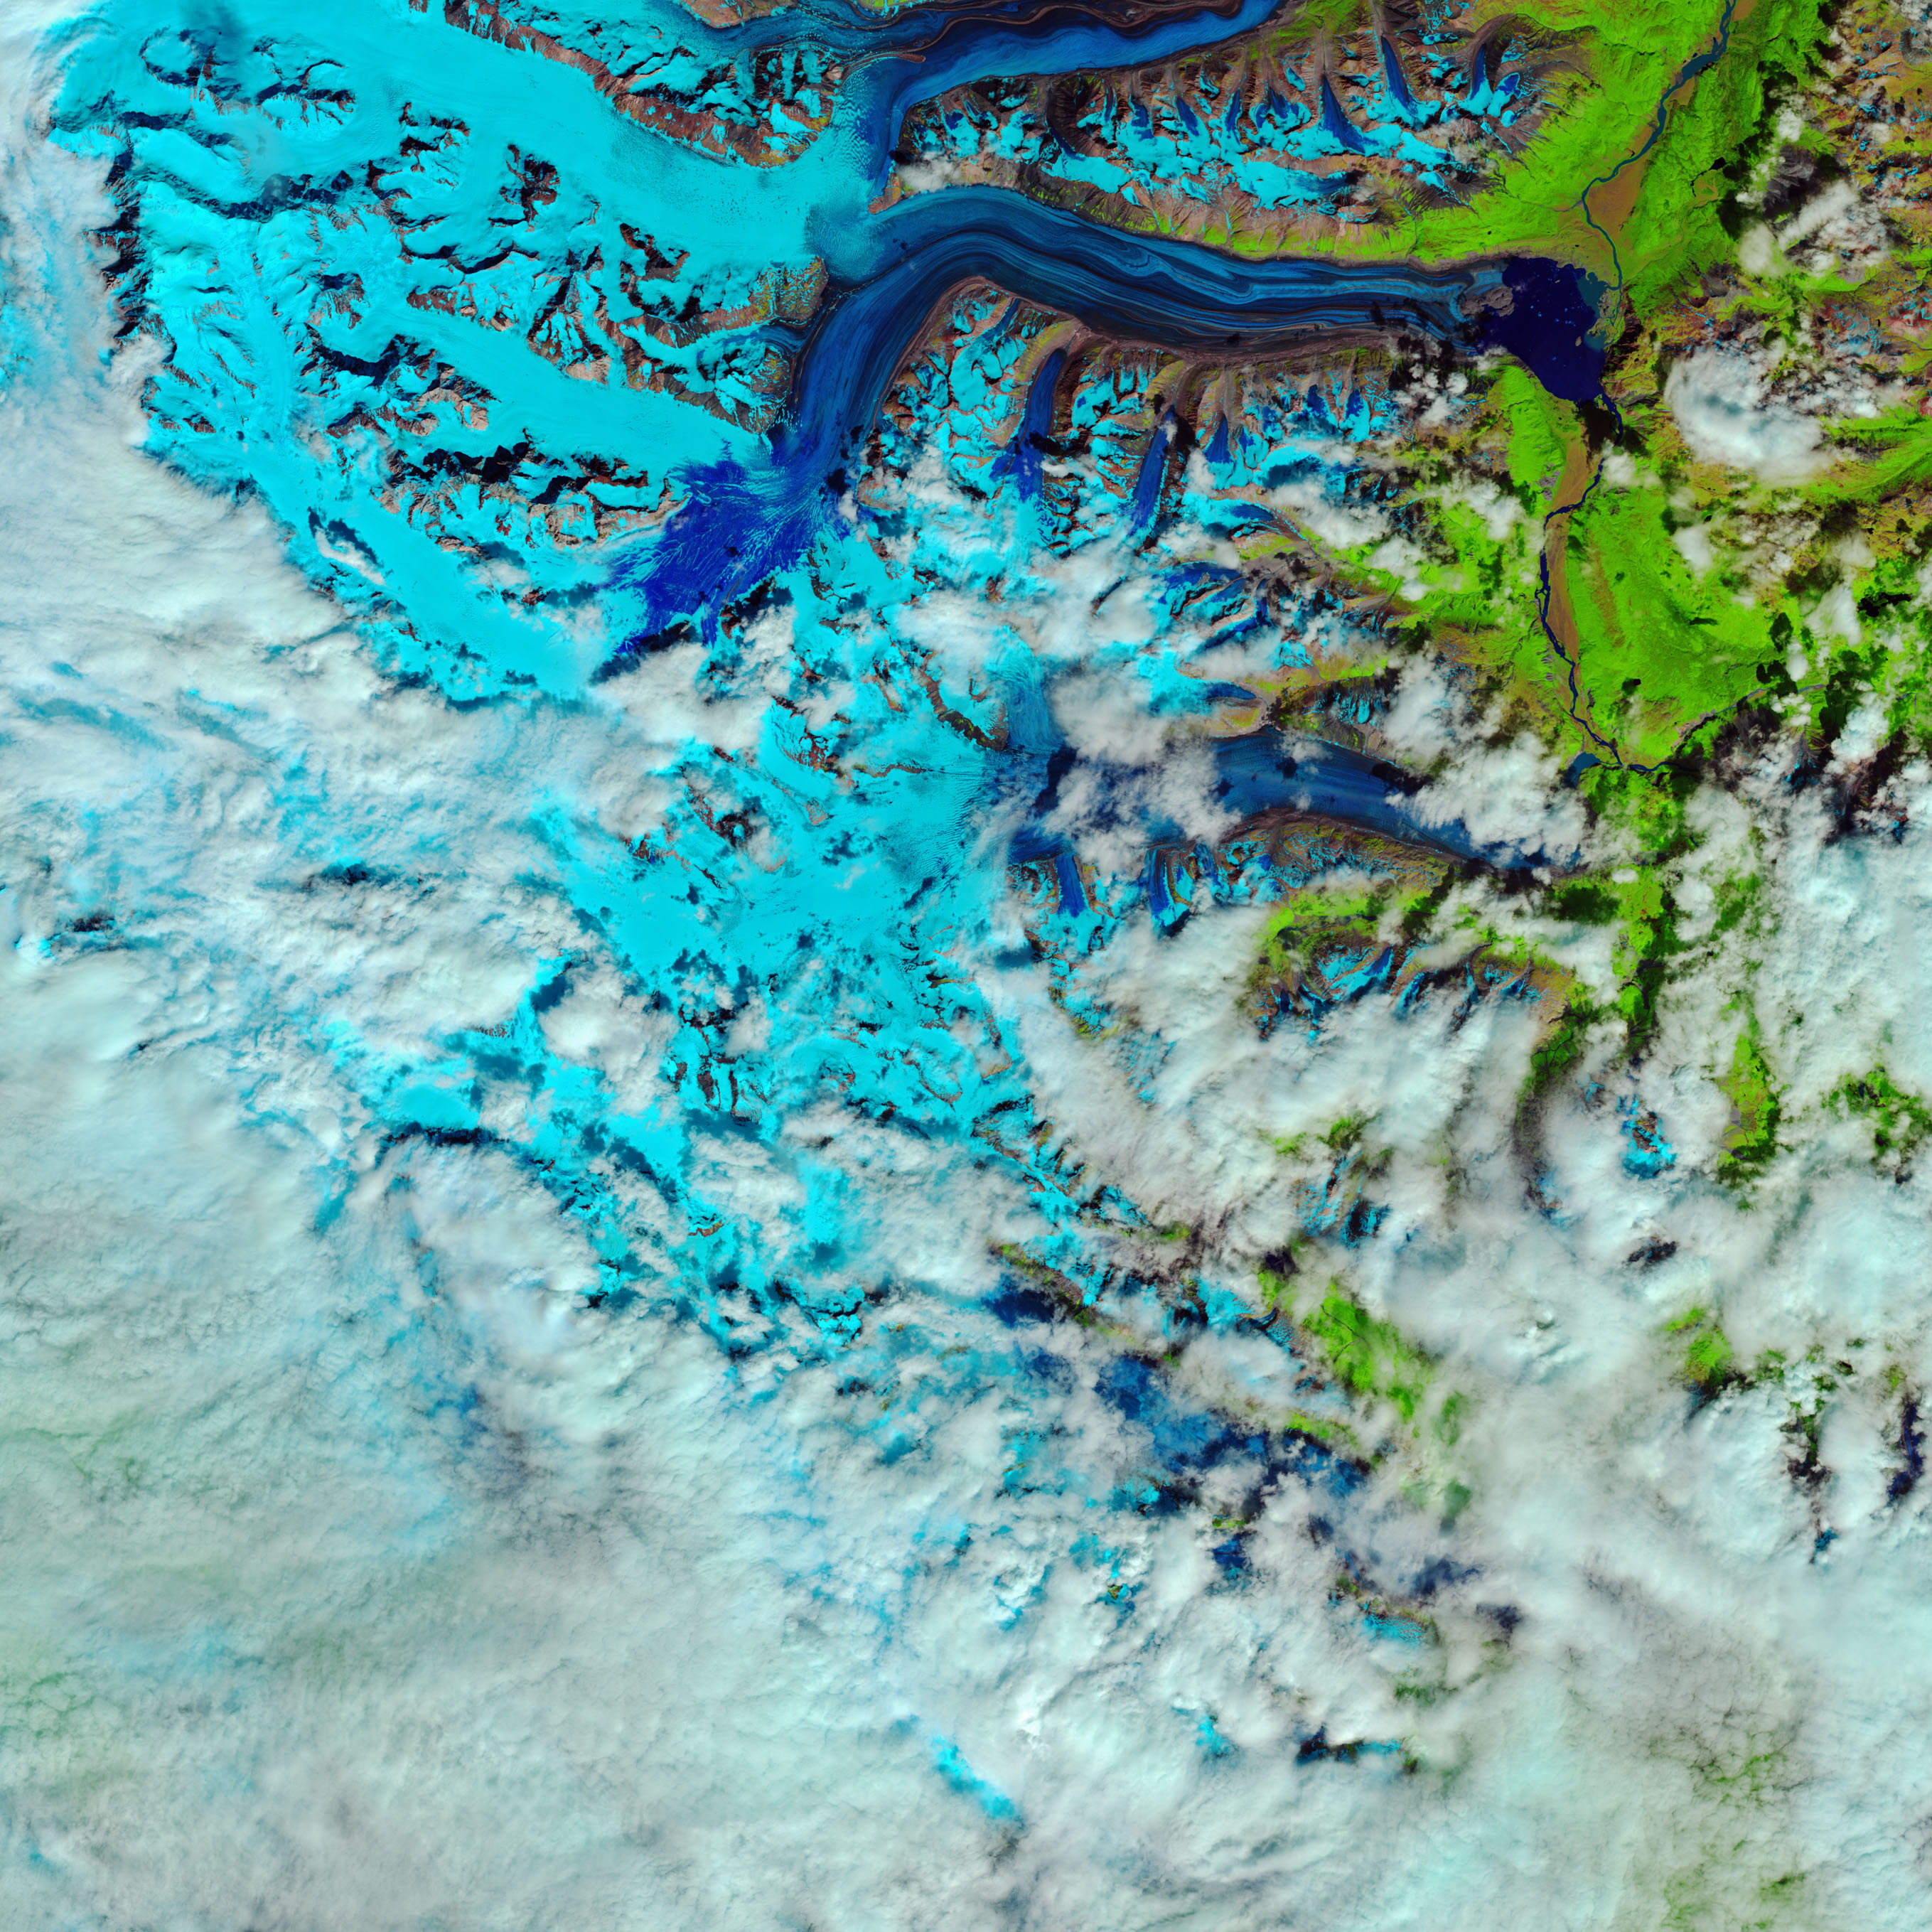 'Snow Swamp' on Canada's Lowell Glacier